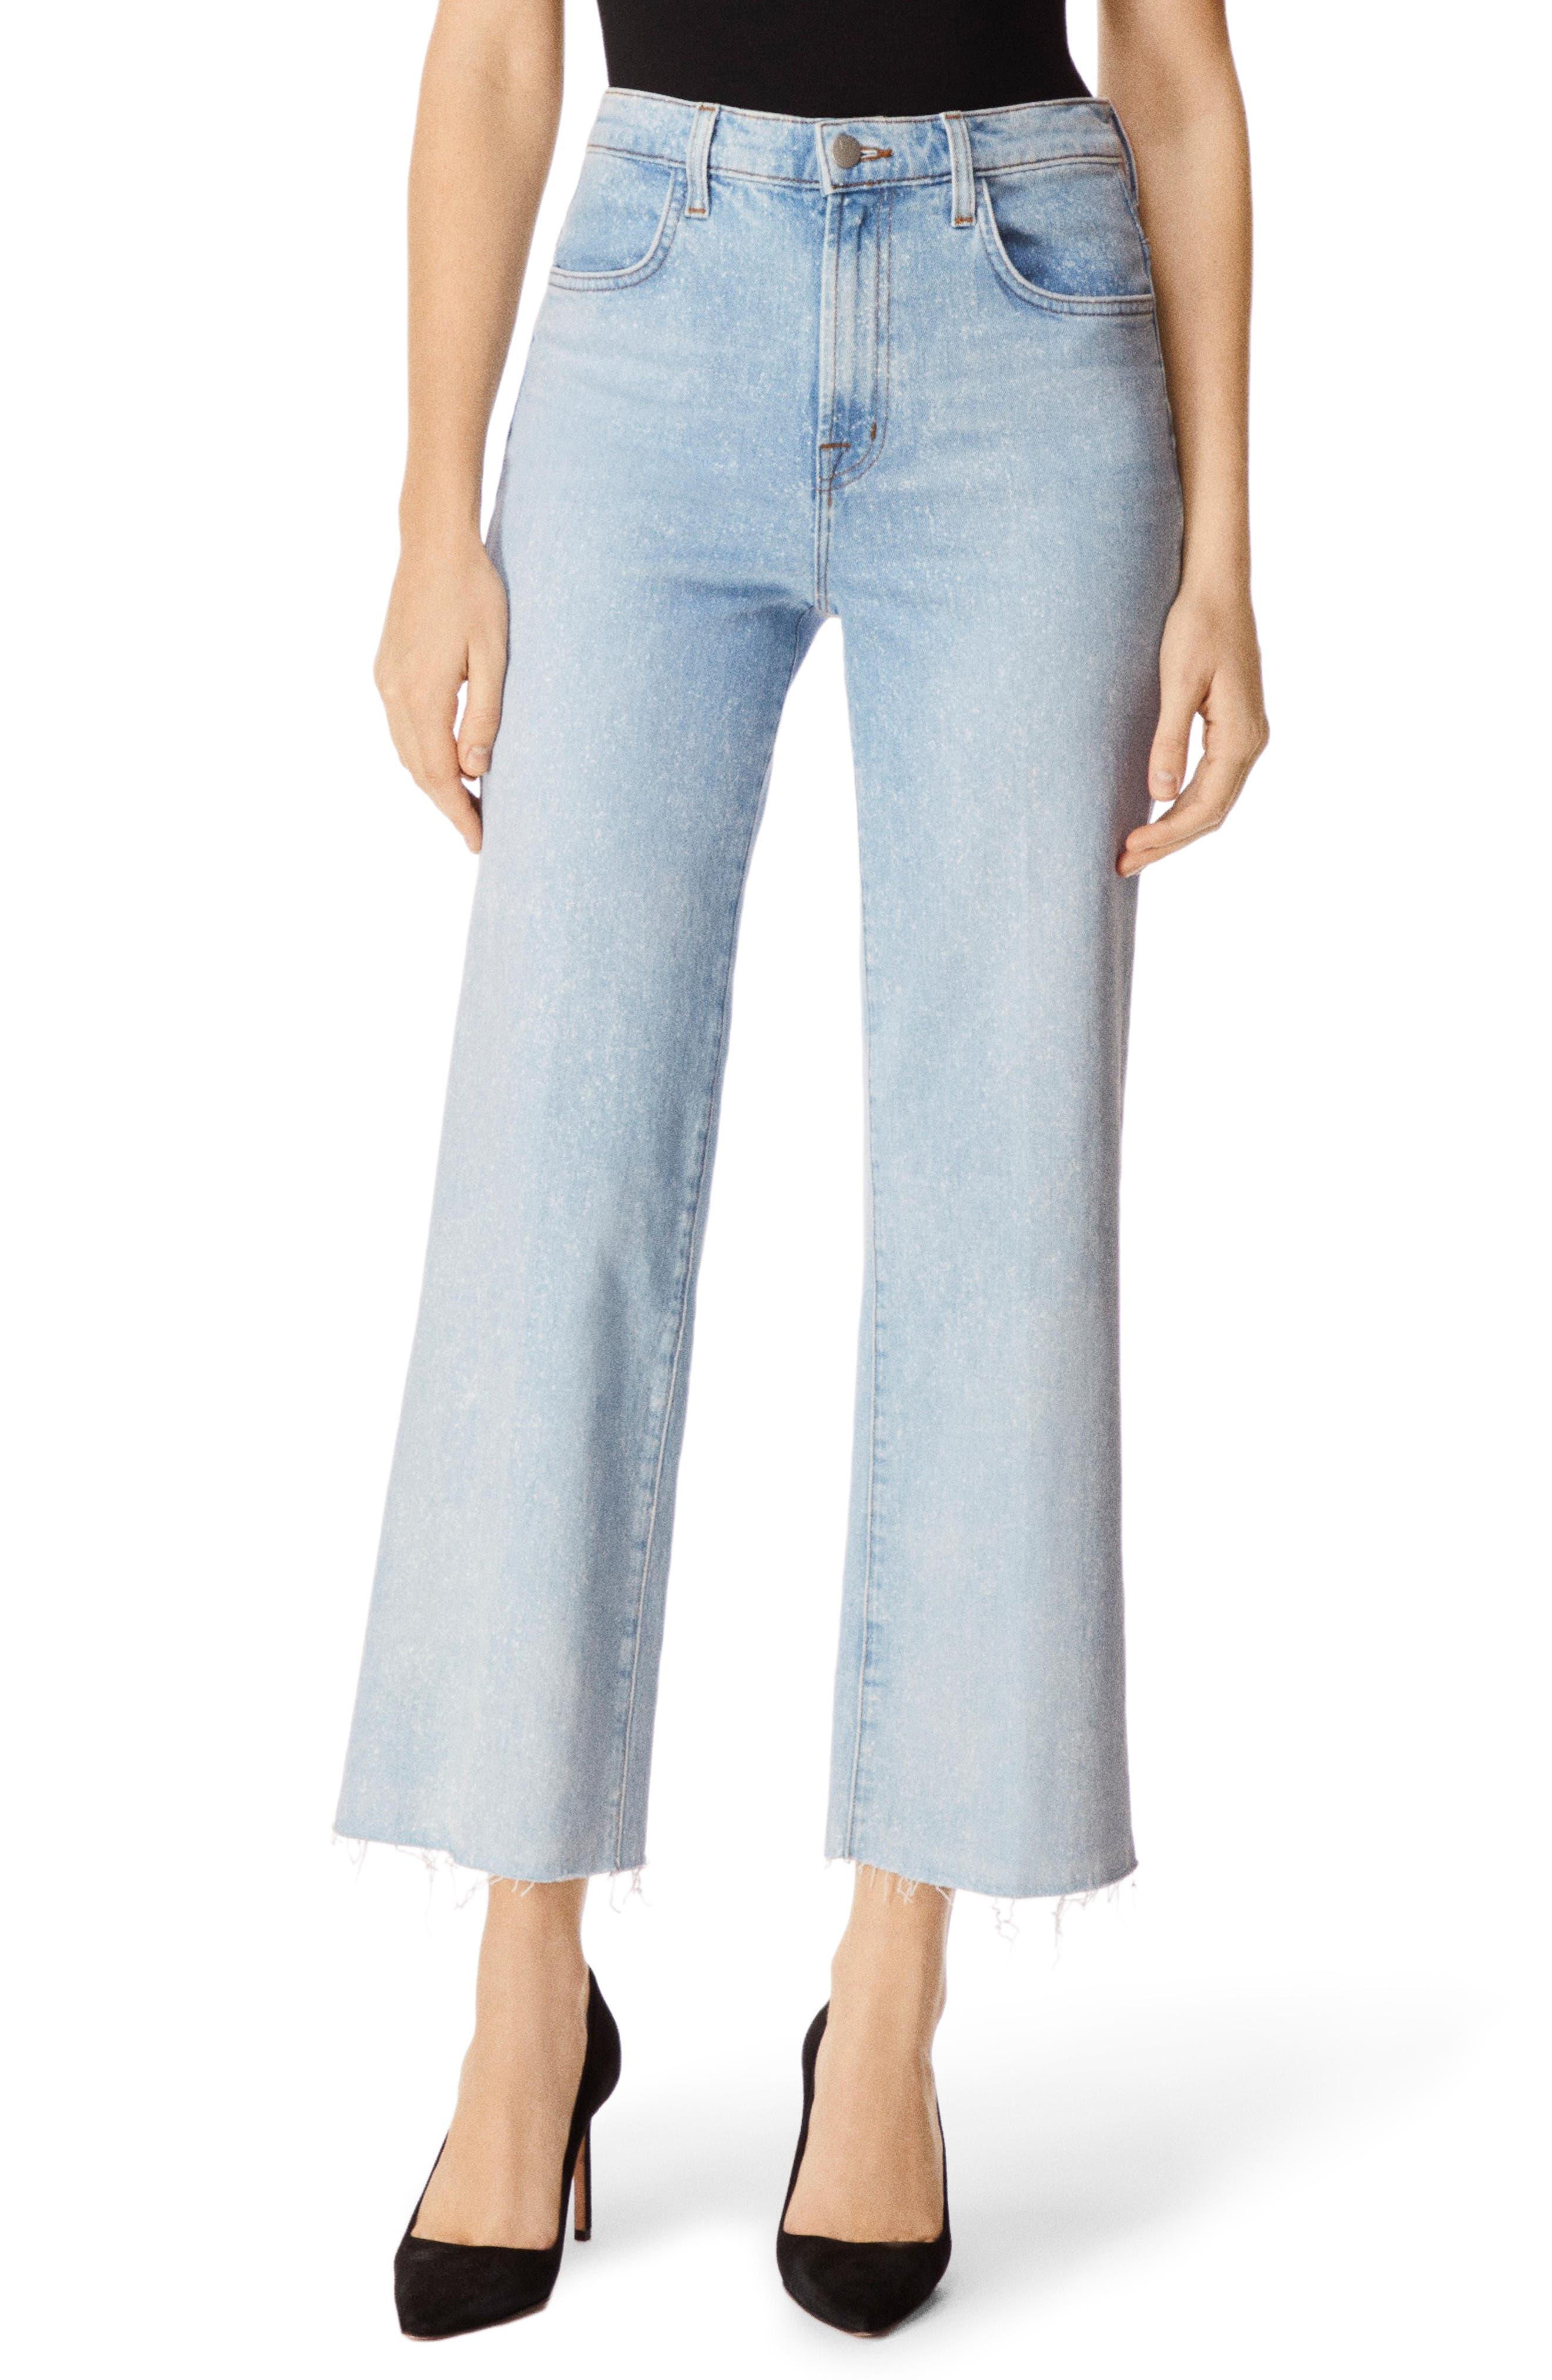 J BRAND, Joan High Waist Crop Wide Leg Jeans, Main thumbnail 1, color, AERGLO